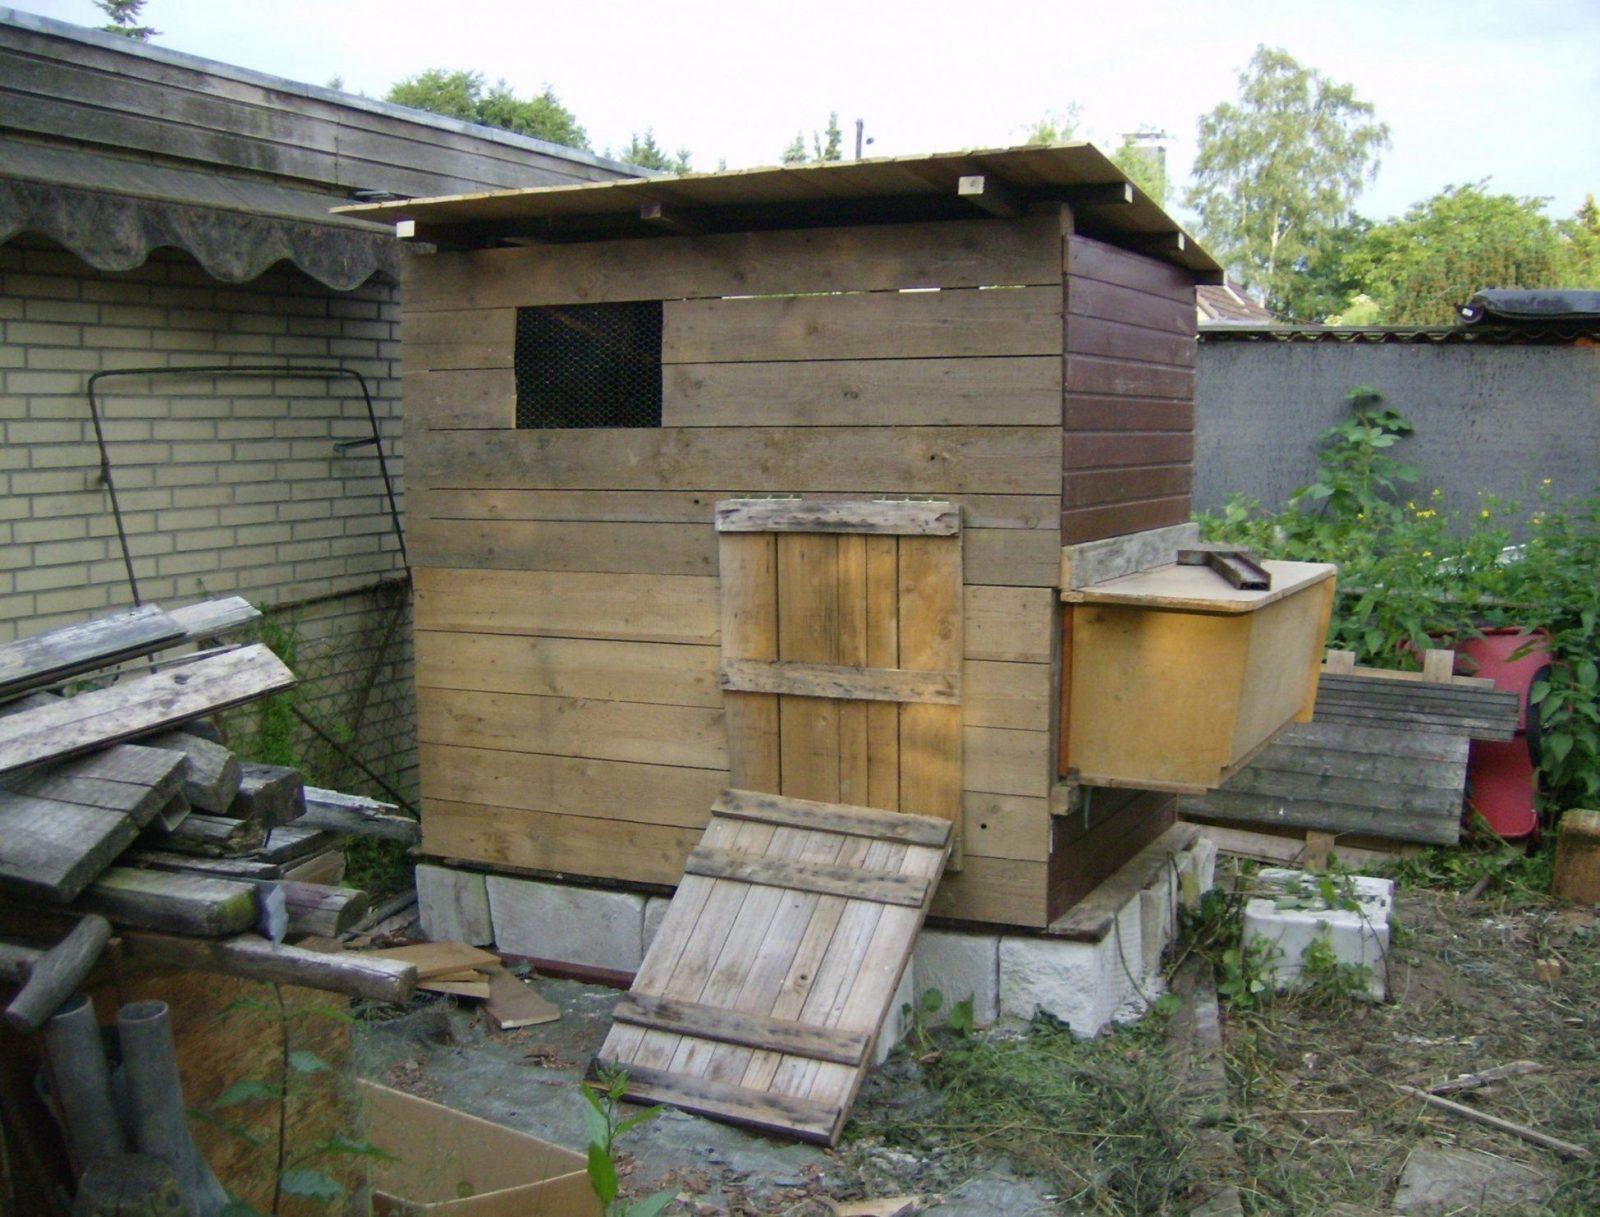 Hobbit Gartenhaus Selber Bauen Haus Selber Bauen Anleitung